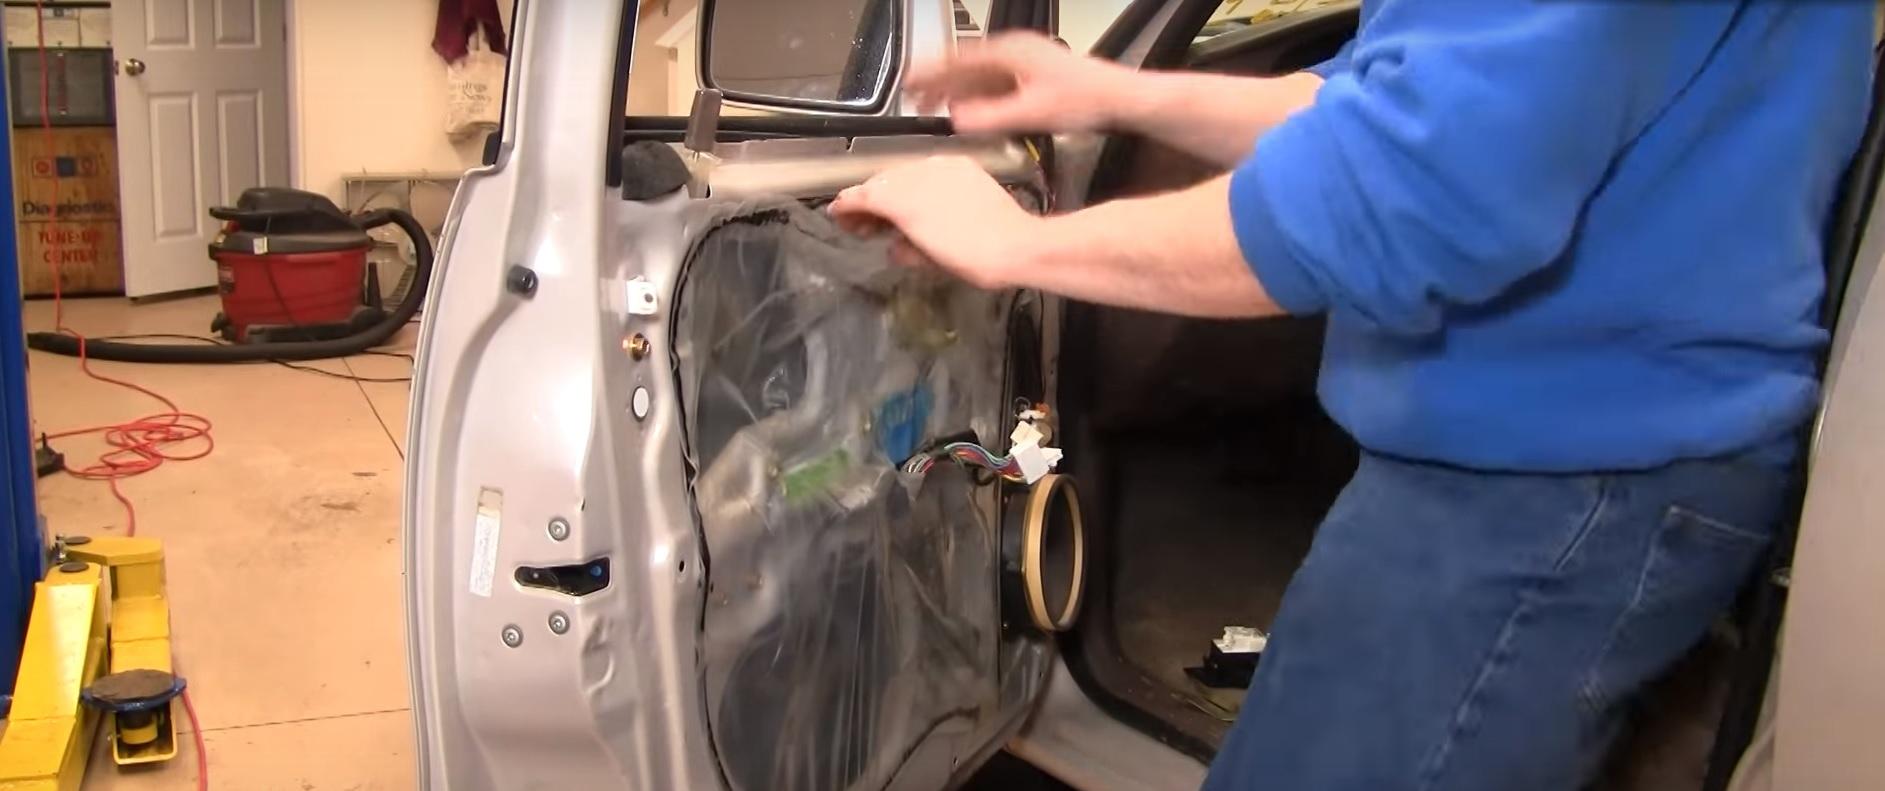 Carefully remove the plastic shield